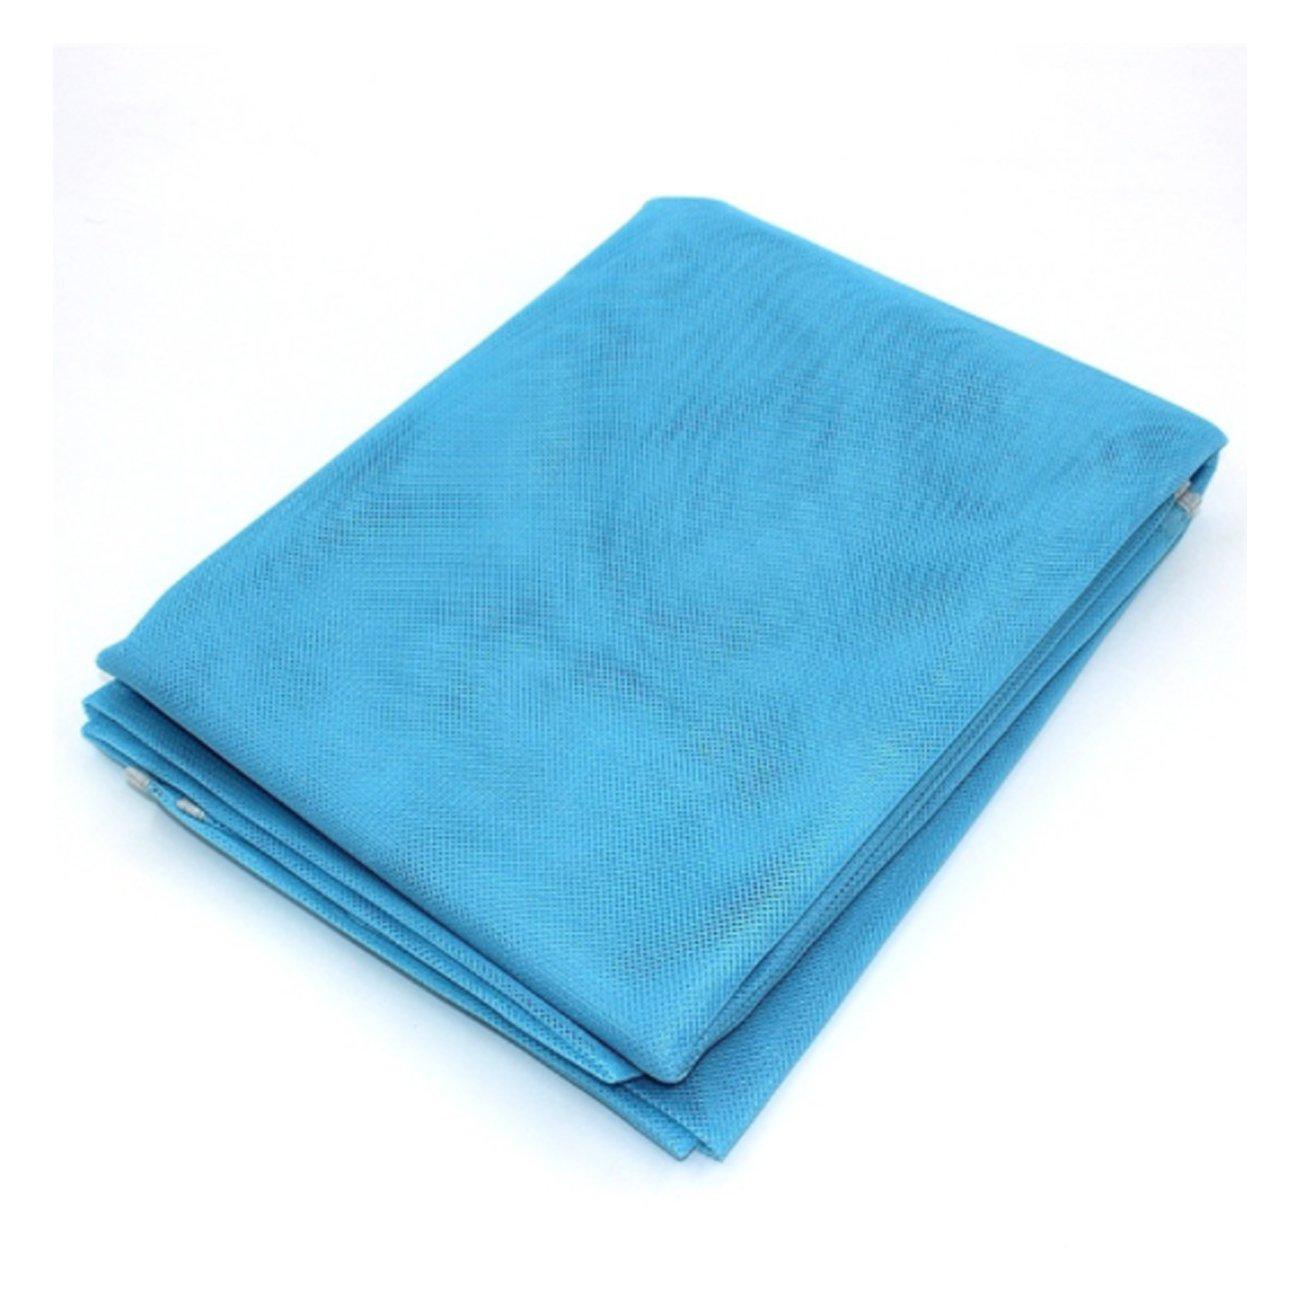 XD Panda Esterilla de Playa con Efecto Anti Arena (Azul)